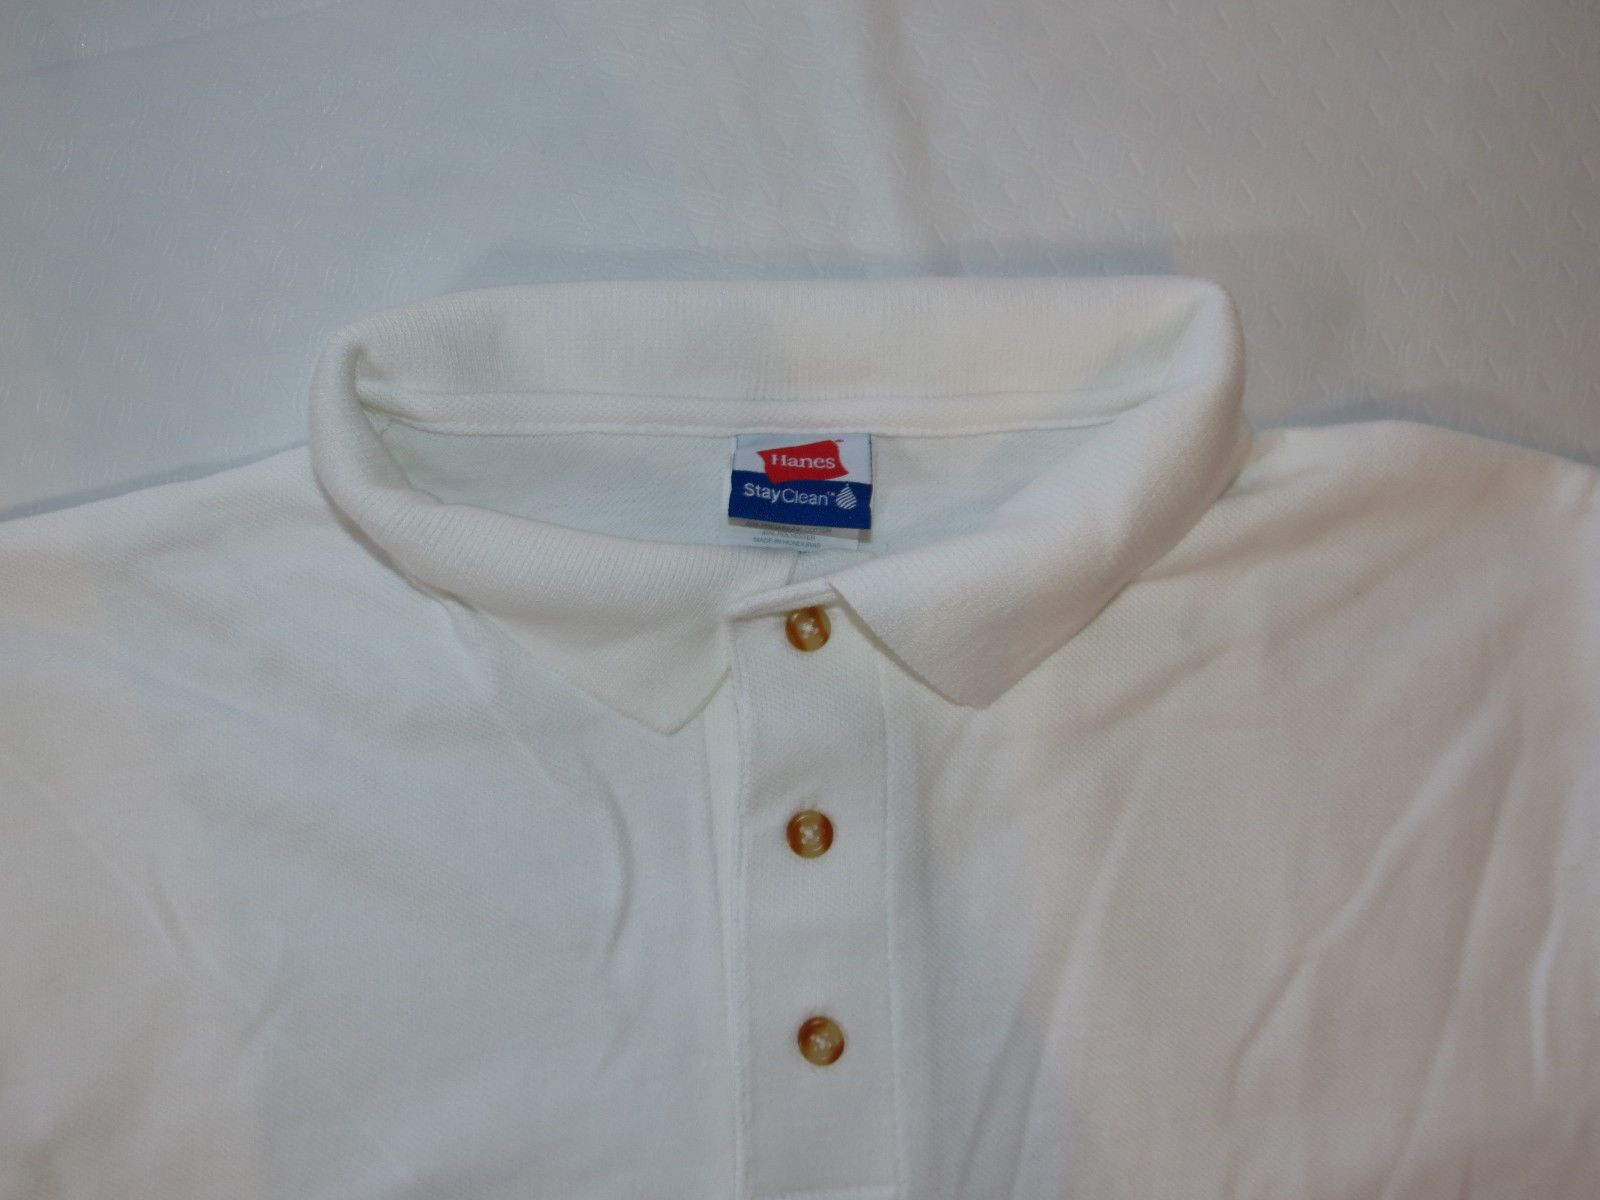 Hanes Stay Clean adult medium M 38-40 mens White short sleeve polo shirt NOS